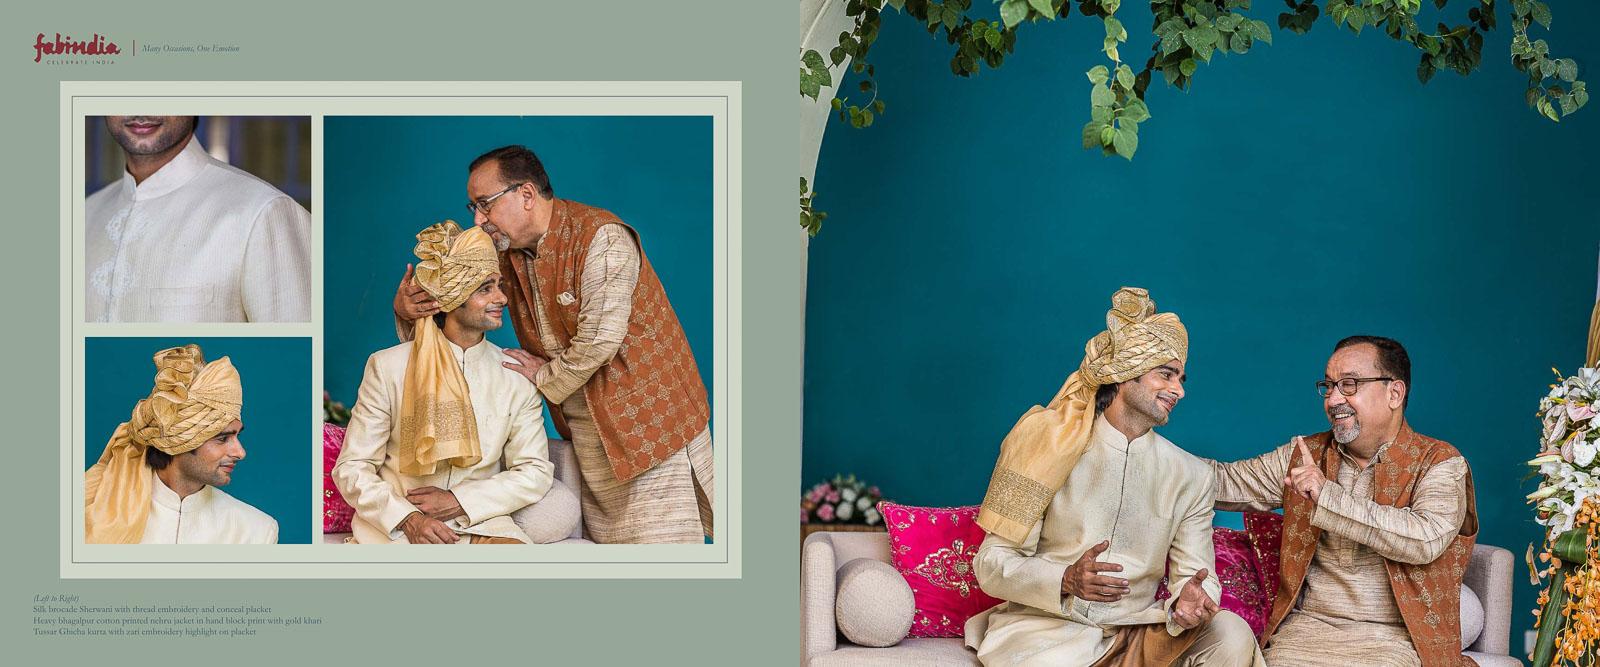 Fashion-Photographer-Fabindia-Ethnic-RamitBatra_05